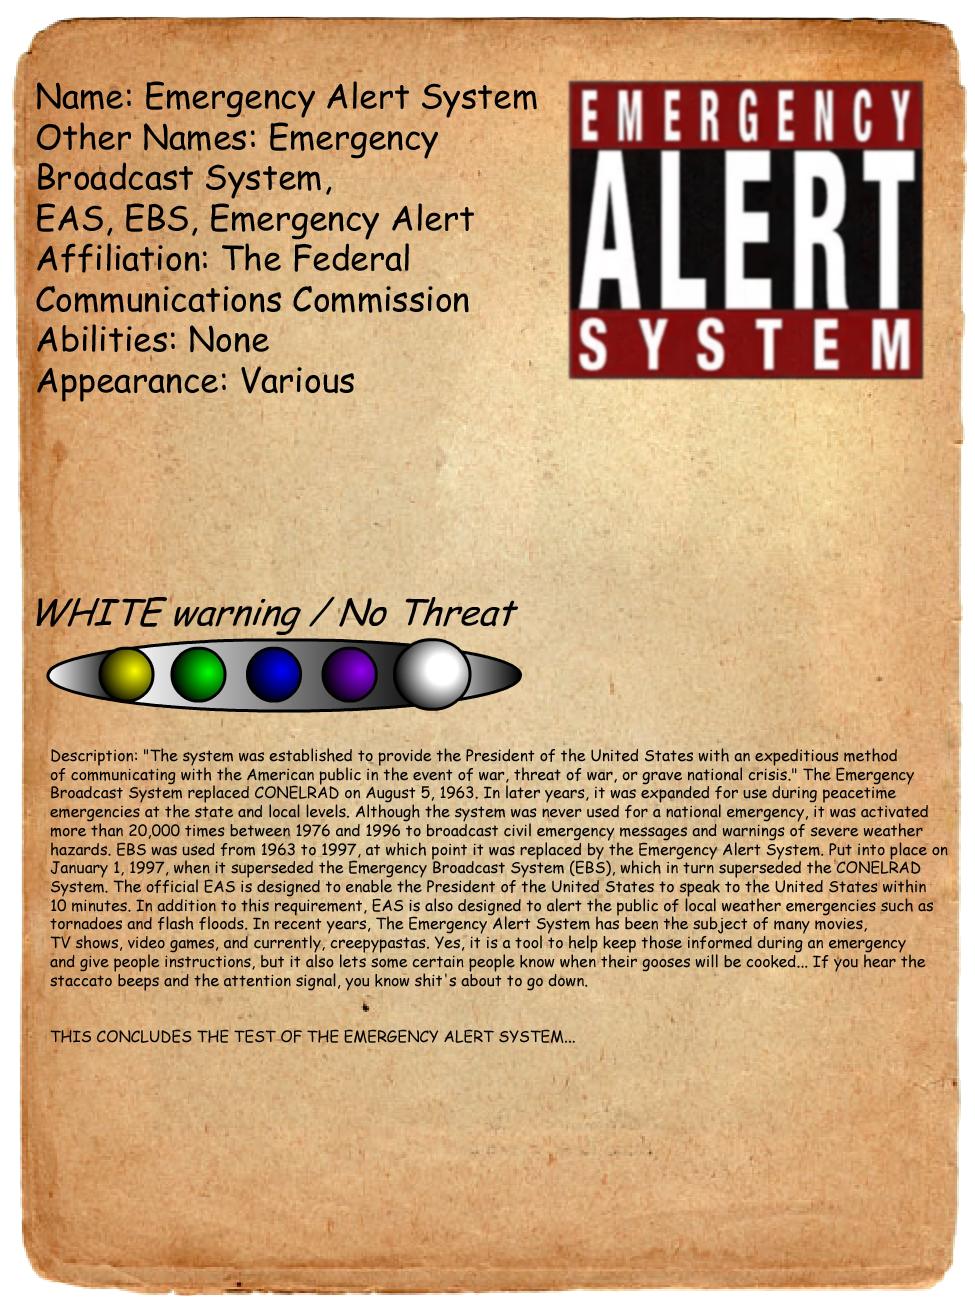 Emergency Alert System Journal Entry